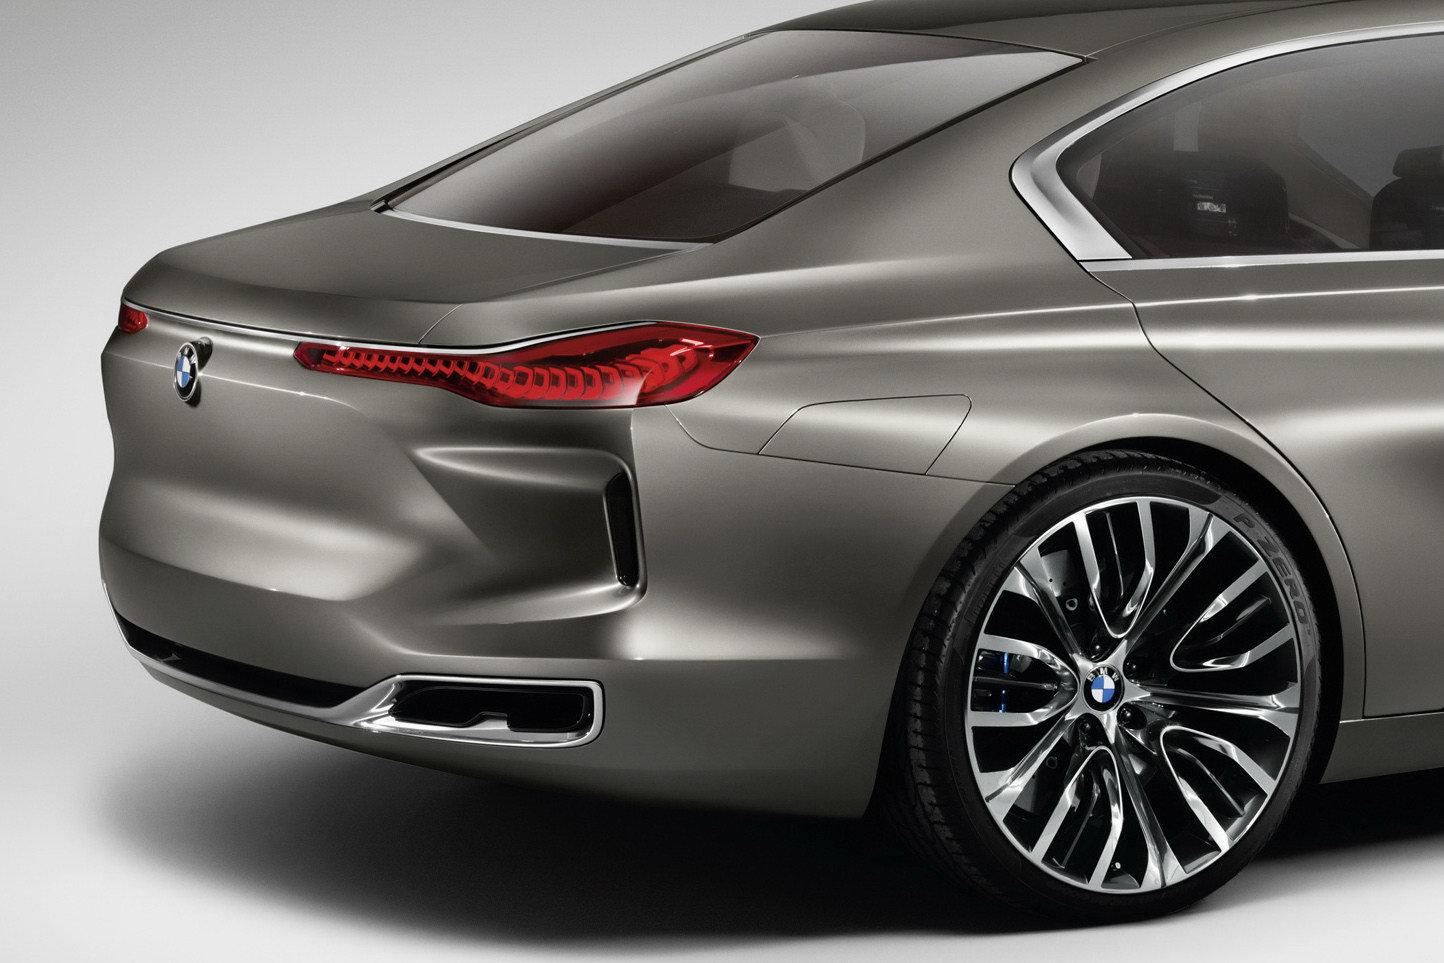 Bmw Vision Future Luxury Concept 18 29